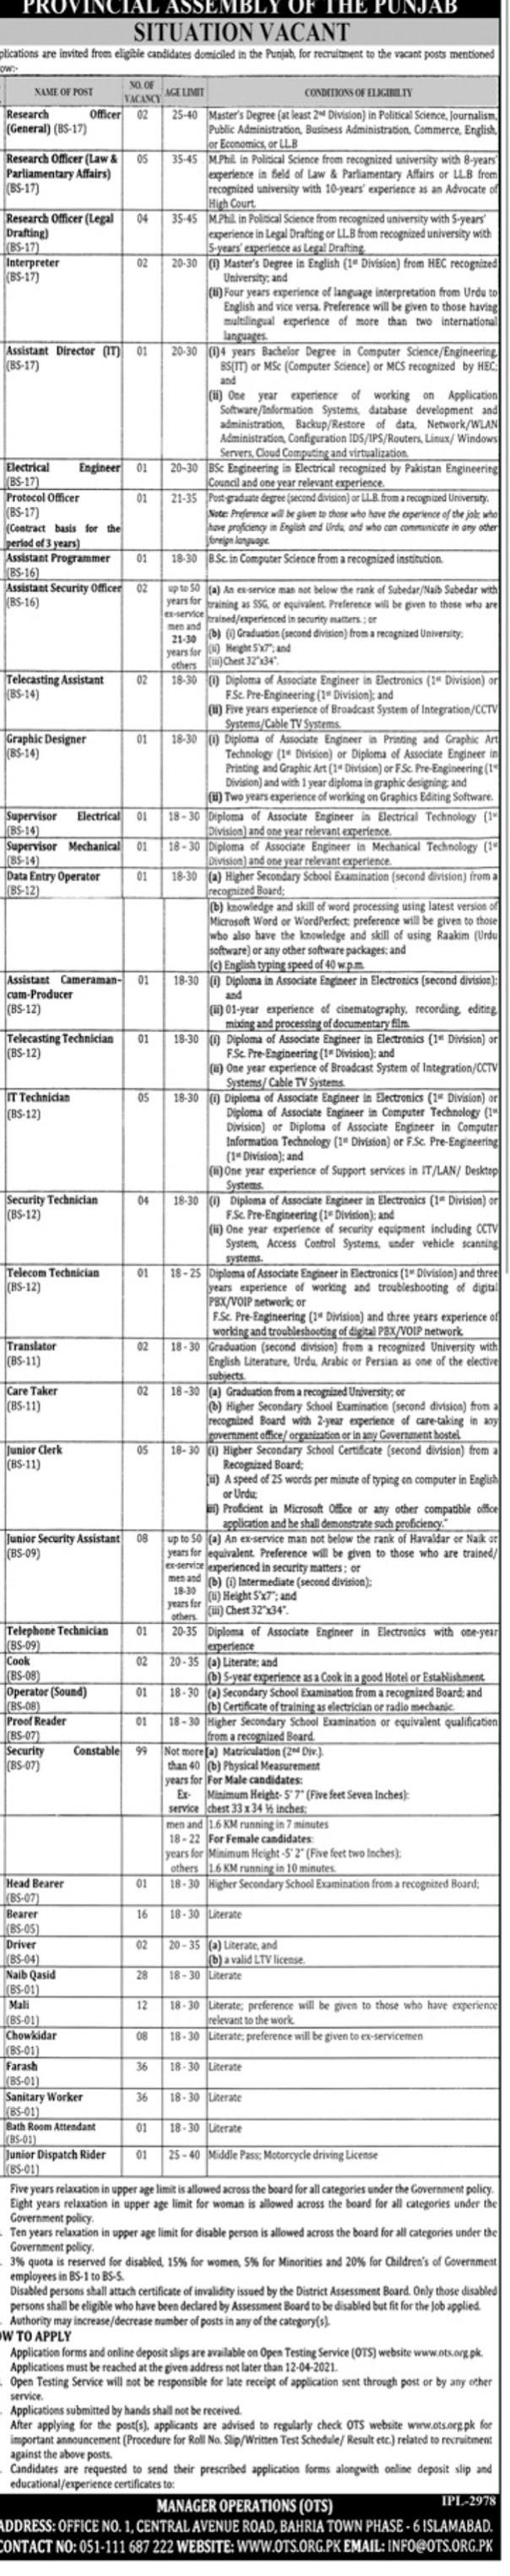 Punjab Assembly Jobs 2021 Latest - Punjab Assembly Police Constable Jobs 2021 - Police Jobs - Data Entry Operator Jobs - Graphic Designer Jobs - Junior Clerk Jobs